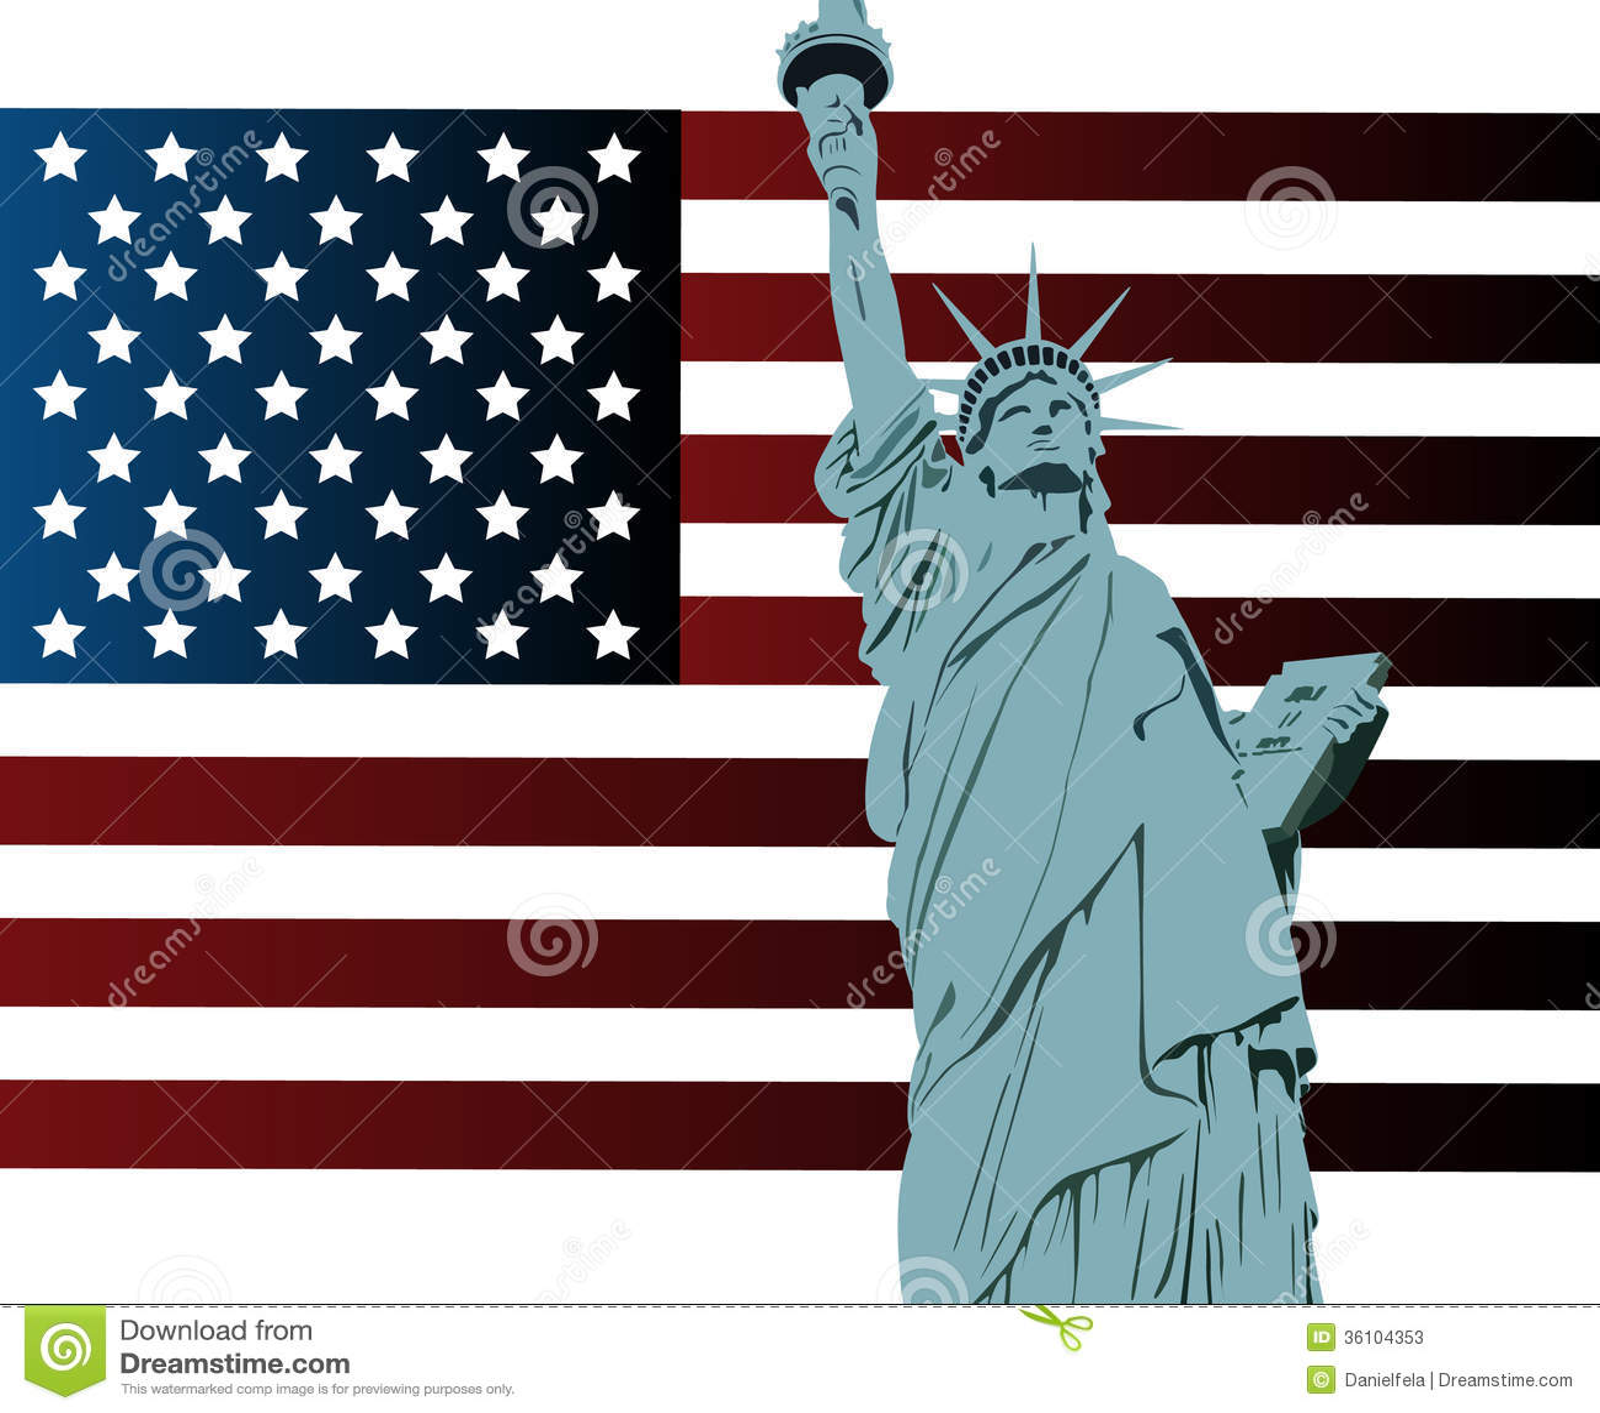 drapeau am ricain et statue de la libert photos stock. Black Bedroom Furniture Sets. Home Design Ideas